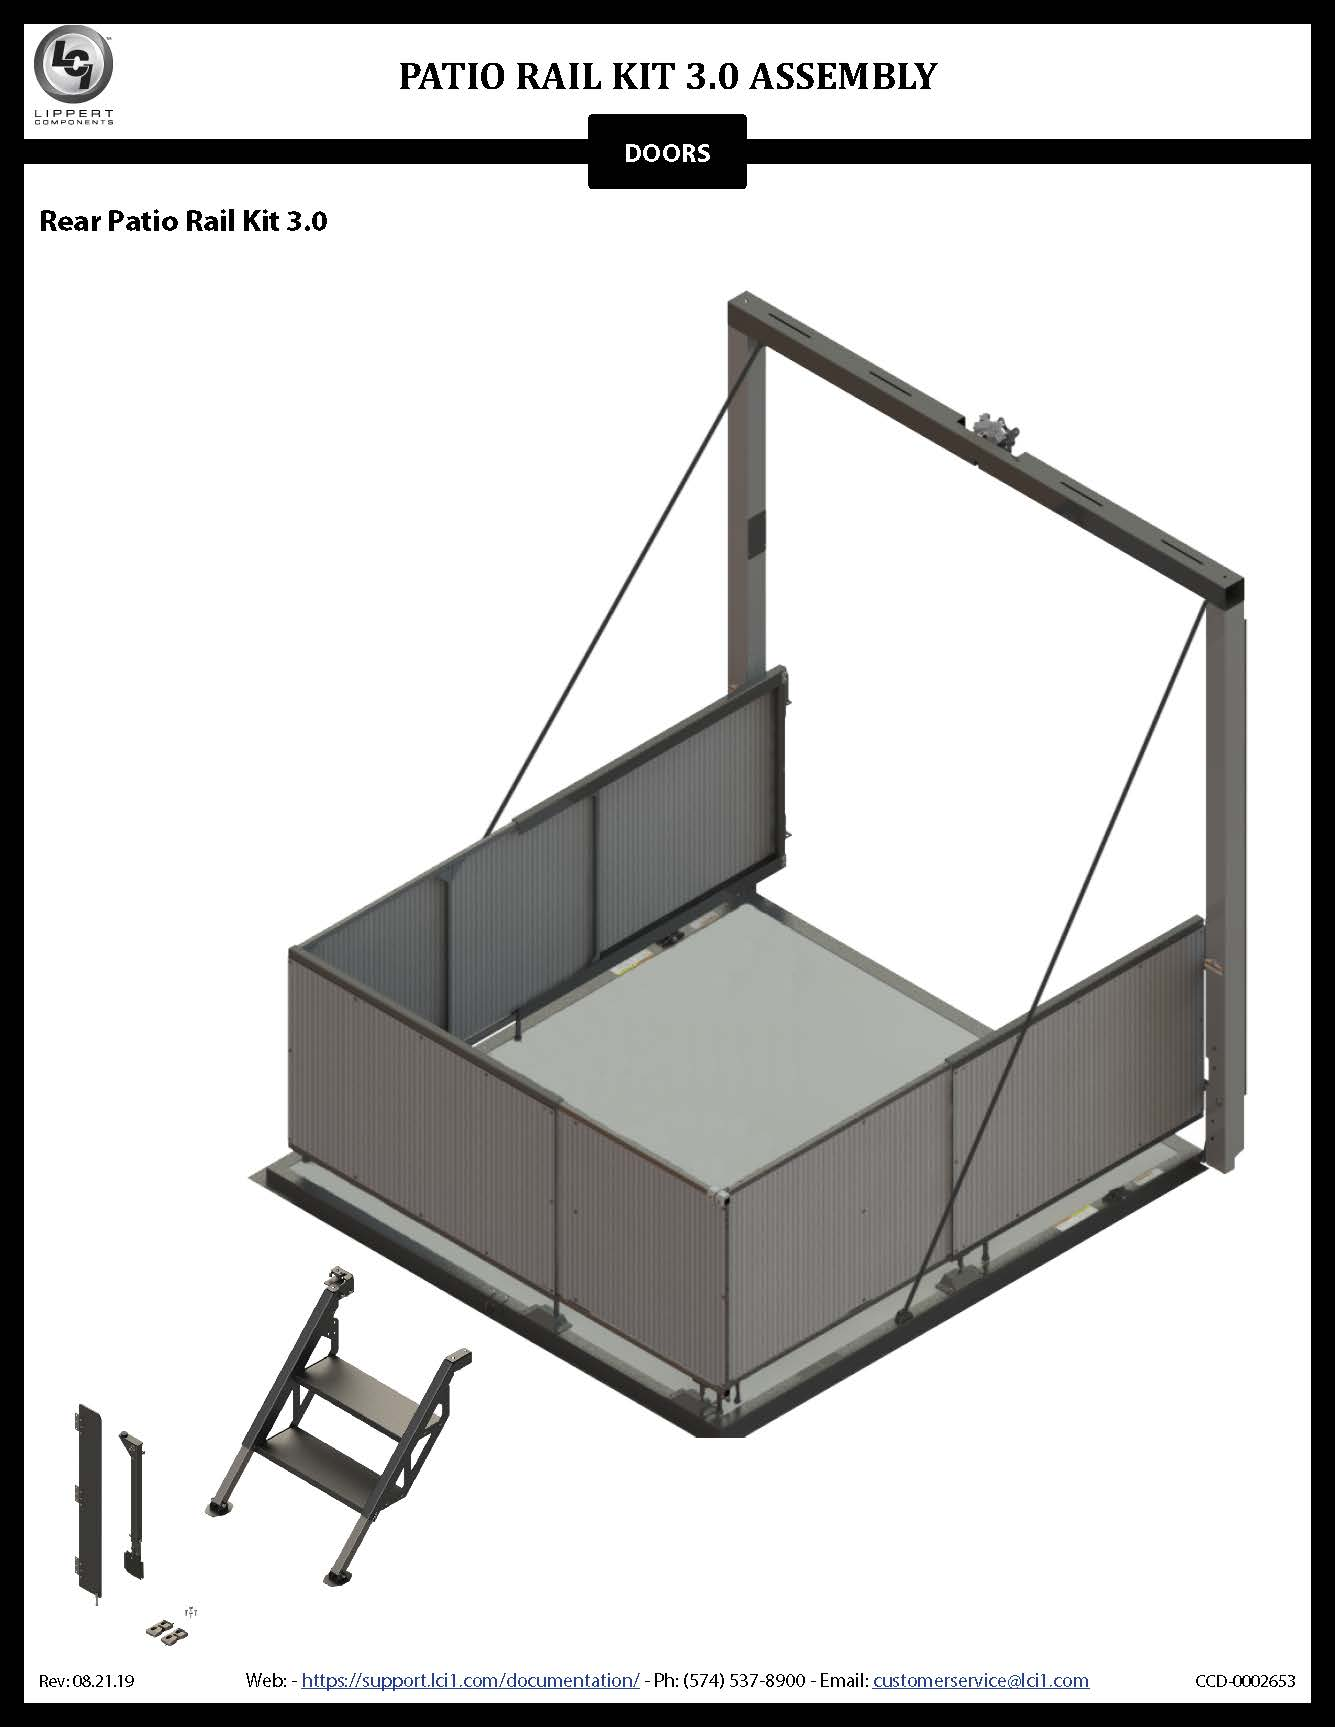 Patio Rail Kit 3.0 Assembly